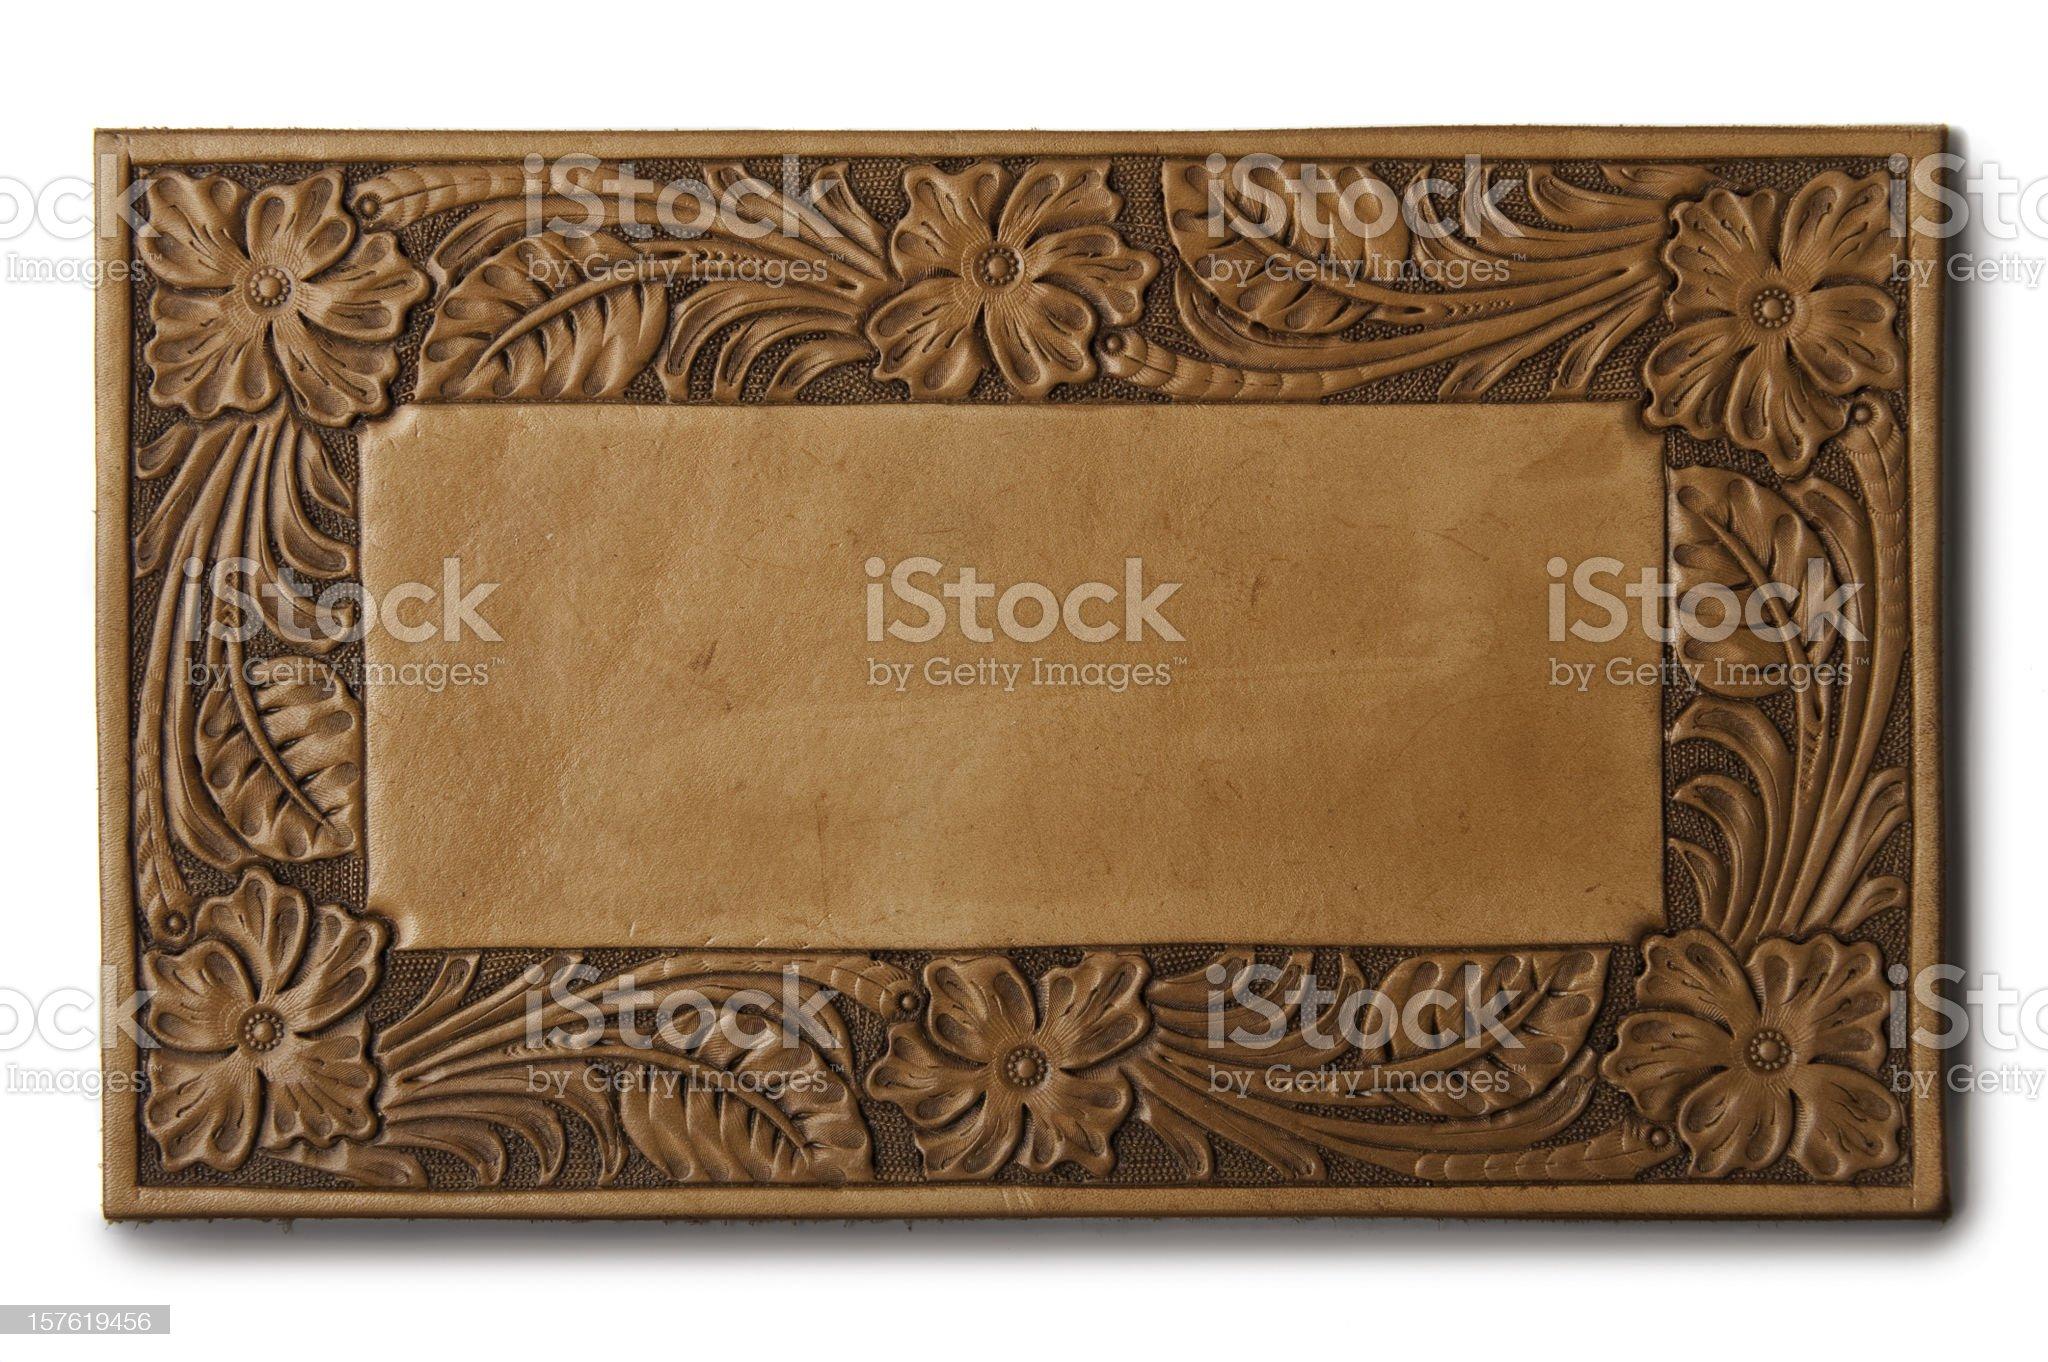 western leather background royalty-free stock photo